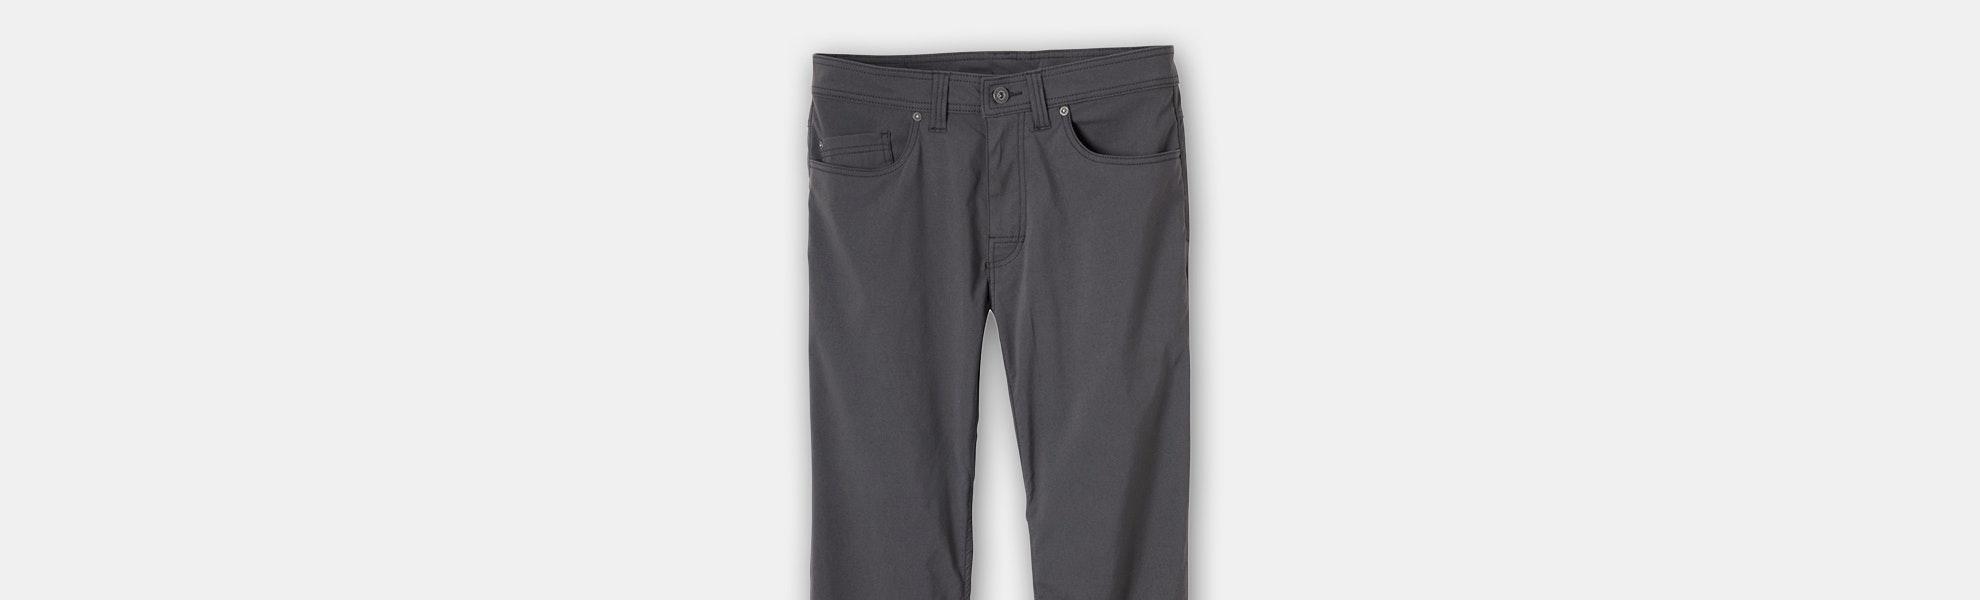 prAna Brion Men's Pants